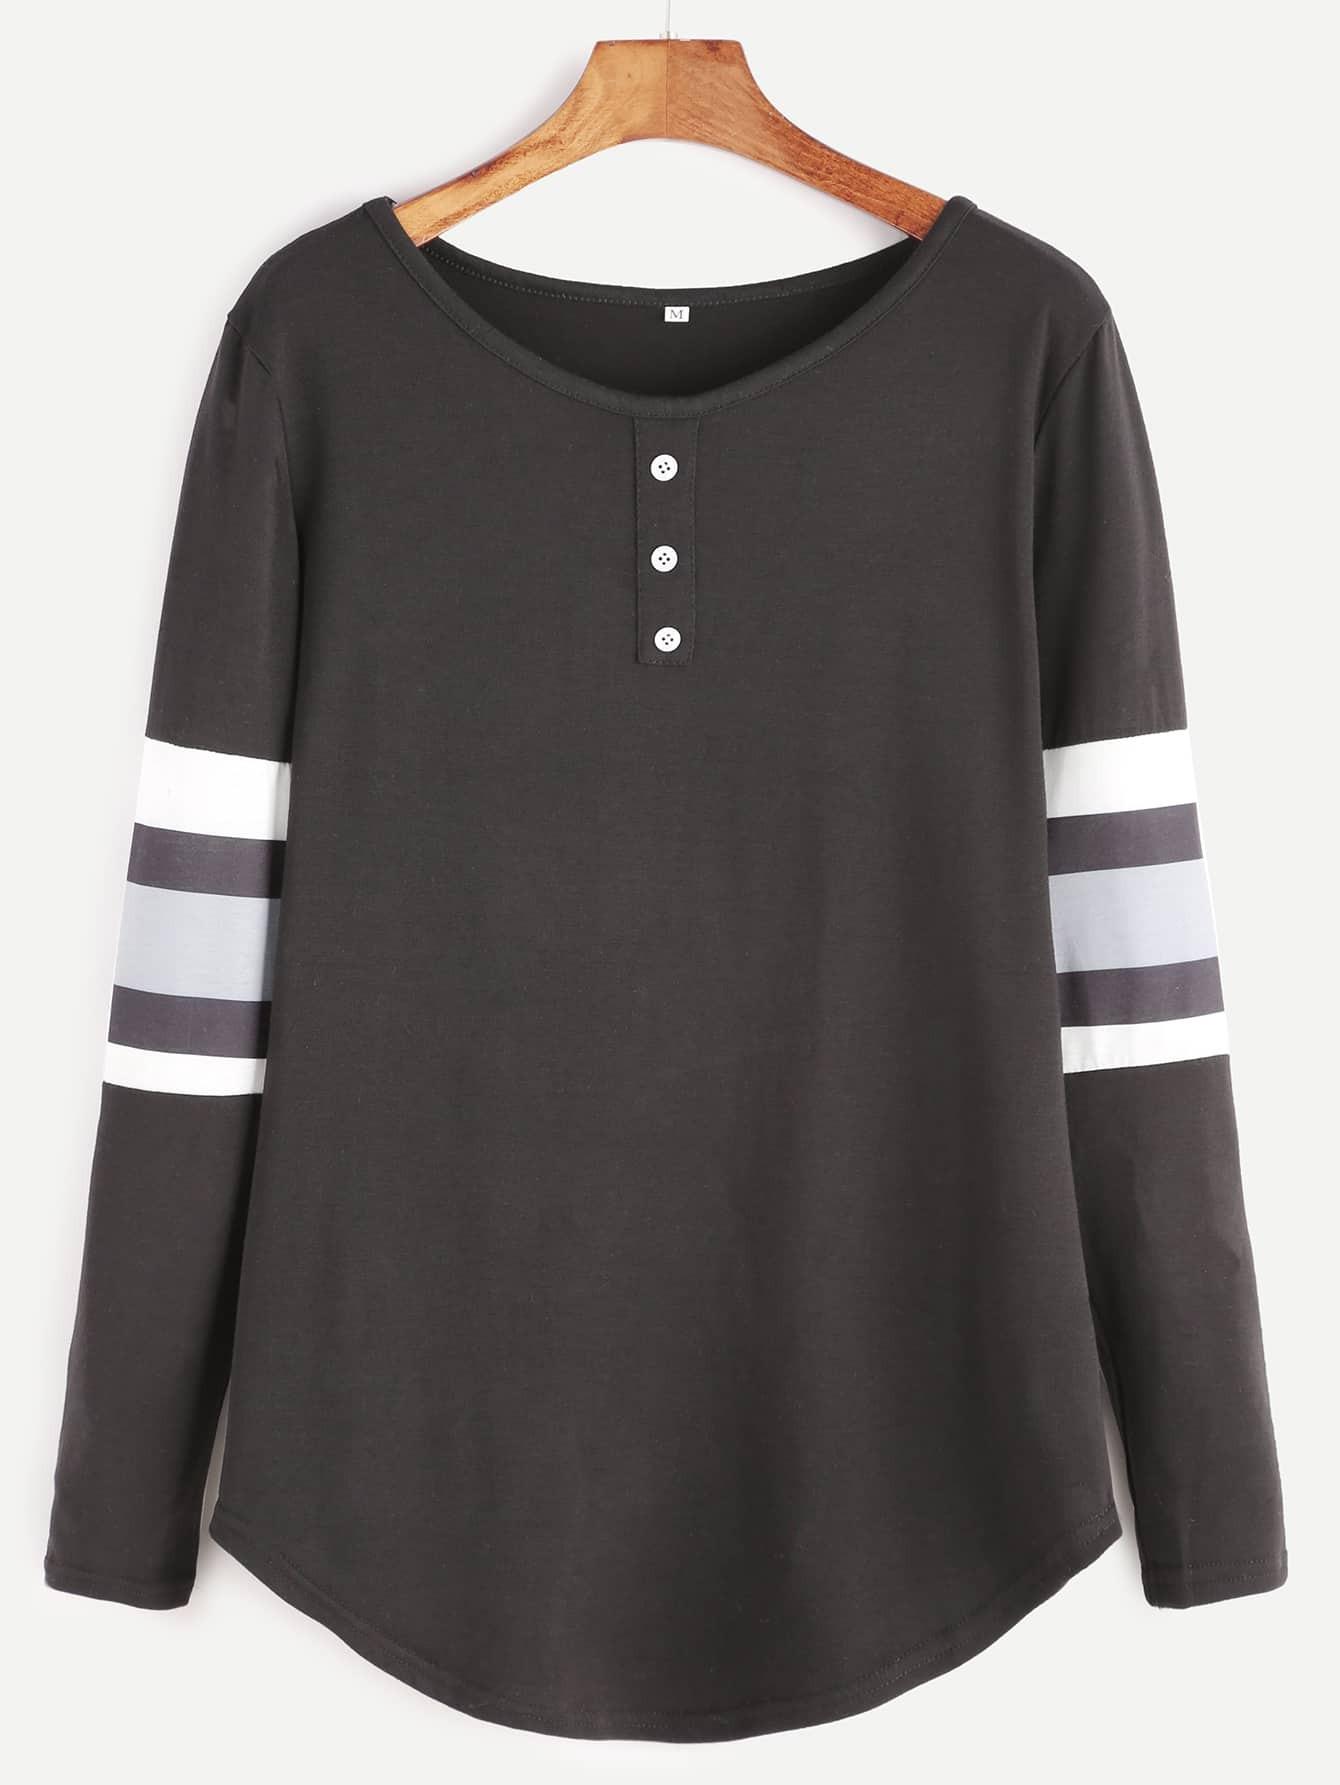 a22c1c0f776 Black Varsity Striped Curved Hem T-shirt EmmaCloth-Women Fast ...